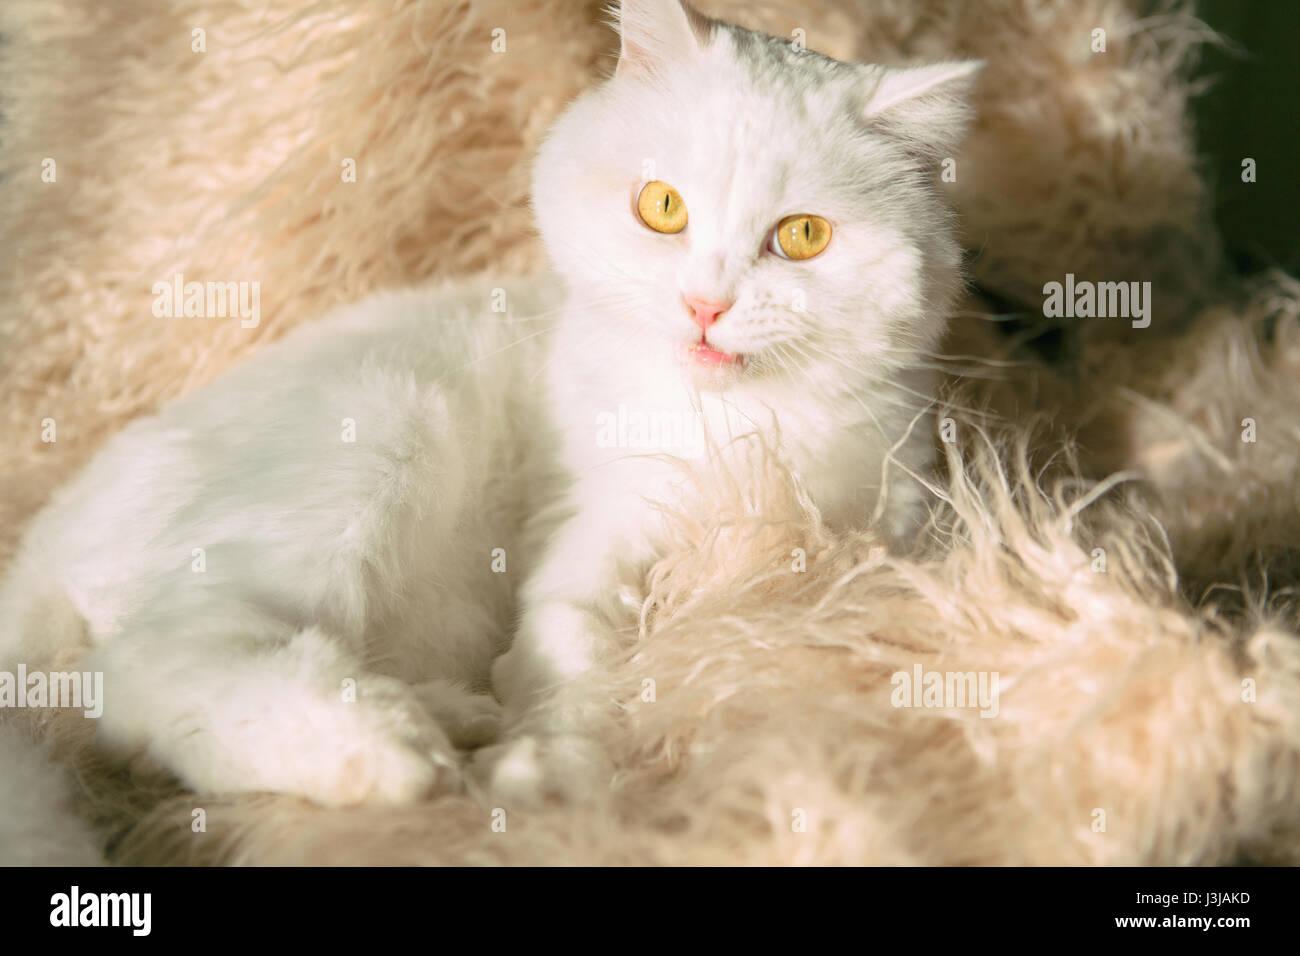 White funny cat Scottish Highland Straight lying on Fluffy blanket - Stock Image